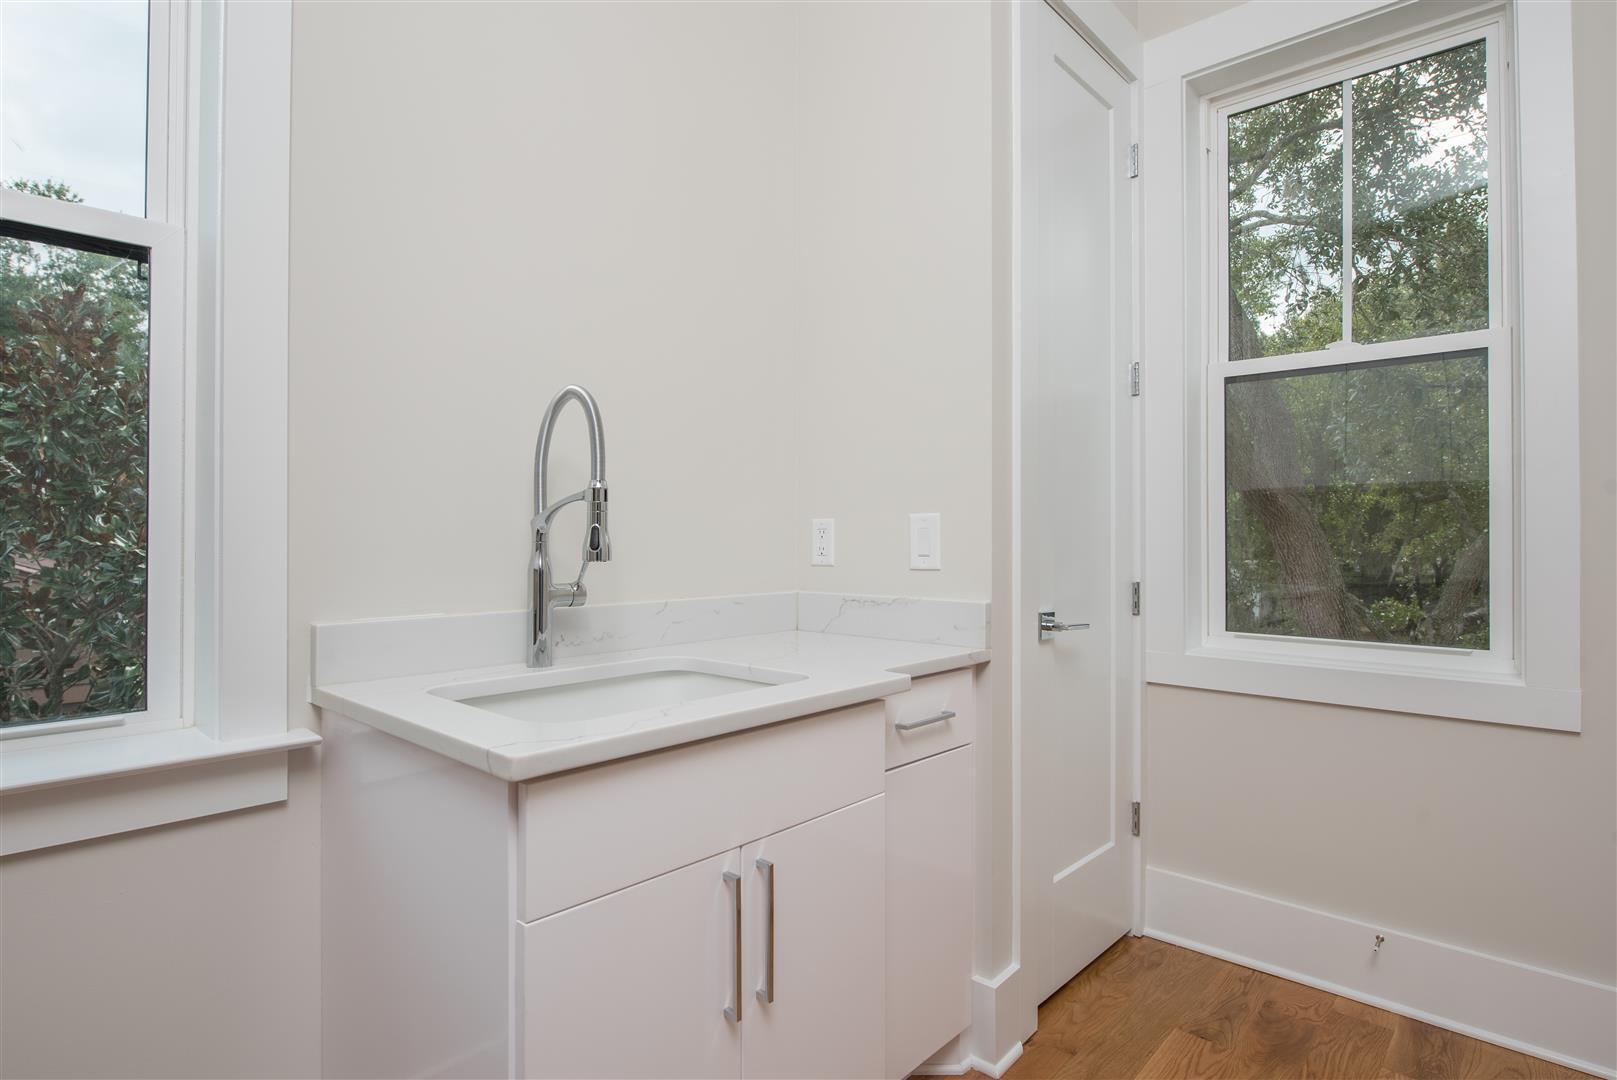 Scanlonville Homes For Sale - 160 5th, Mount Pleasant, SC - 17